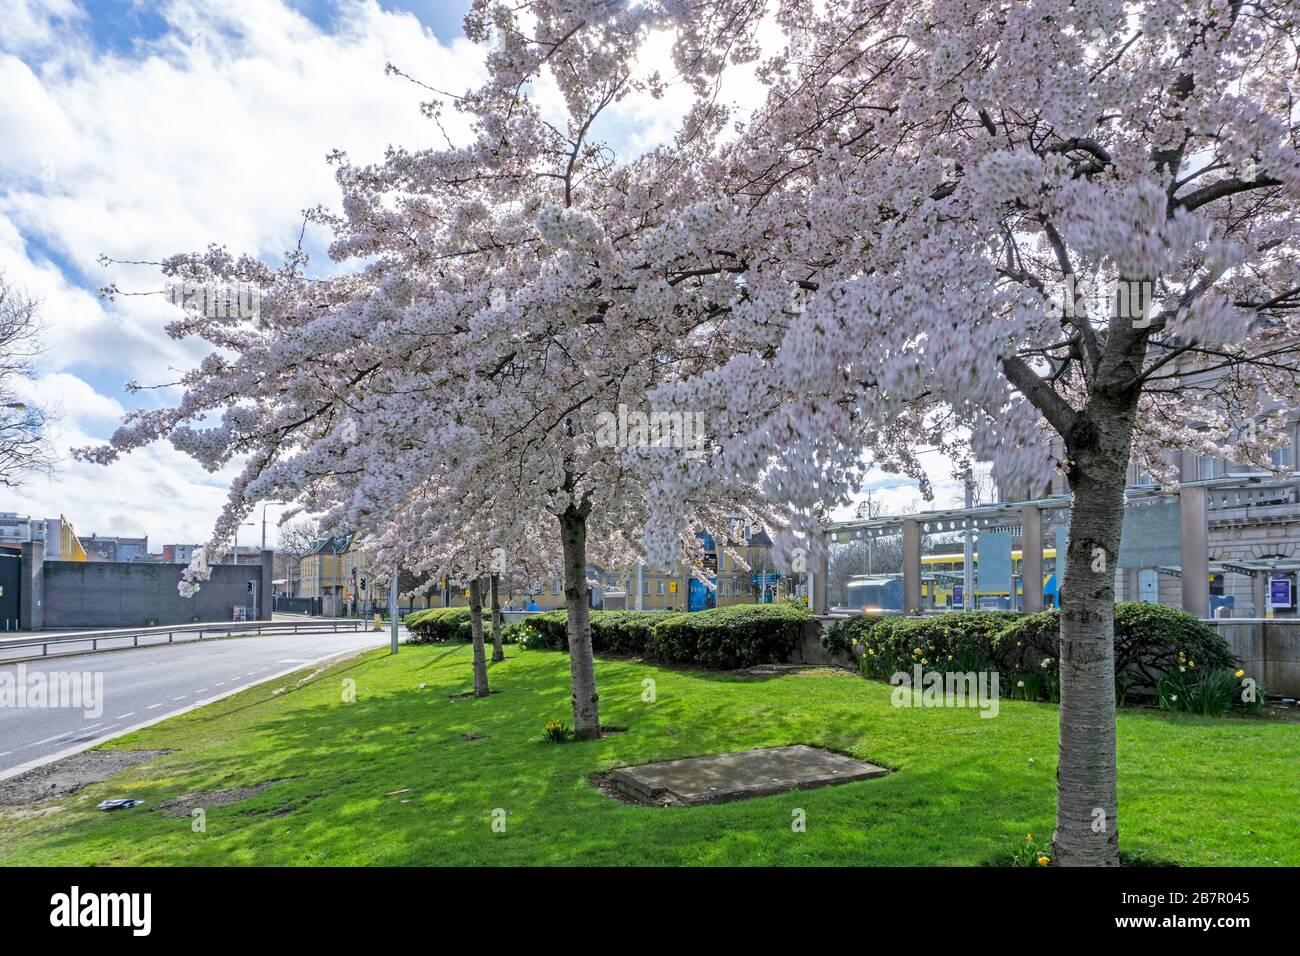 A Group Of Cherry Blossom Trees In Full Bloom Near Heuston Railway Station Dublin Ireland Stock Photo Alamy